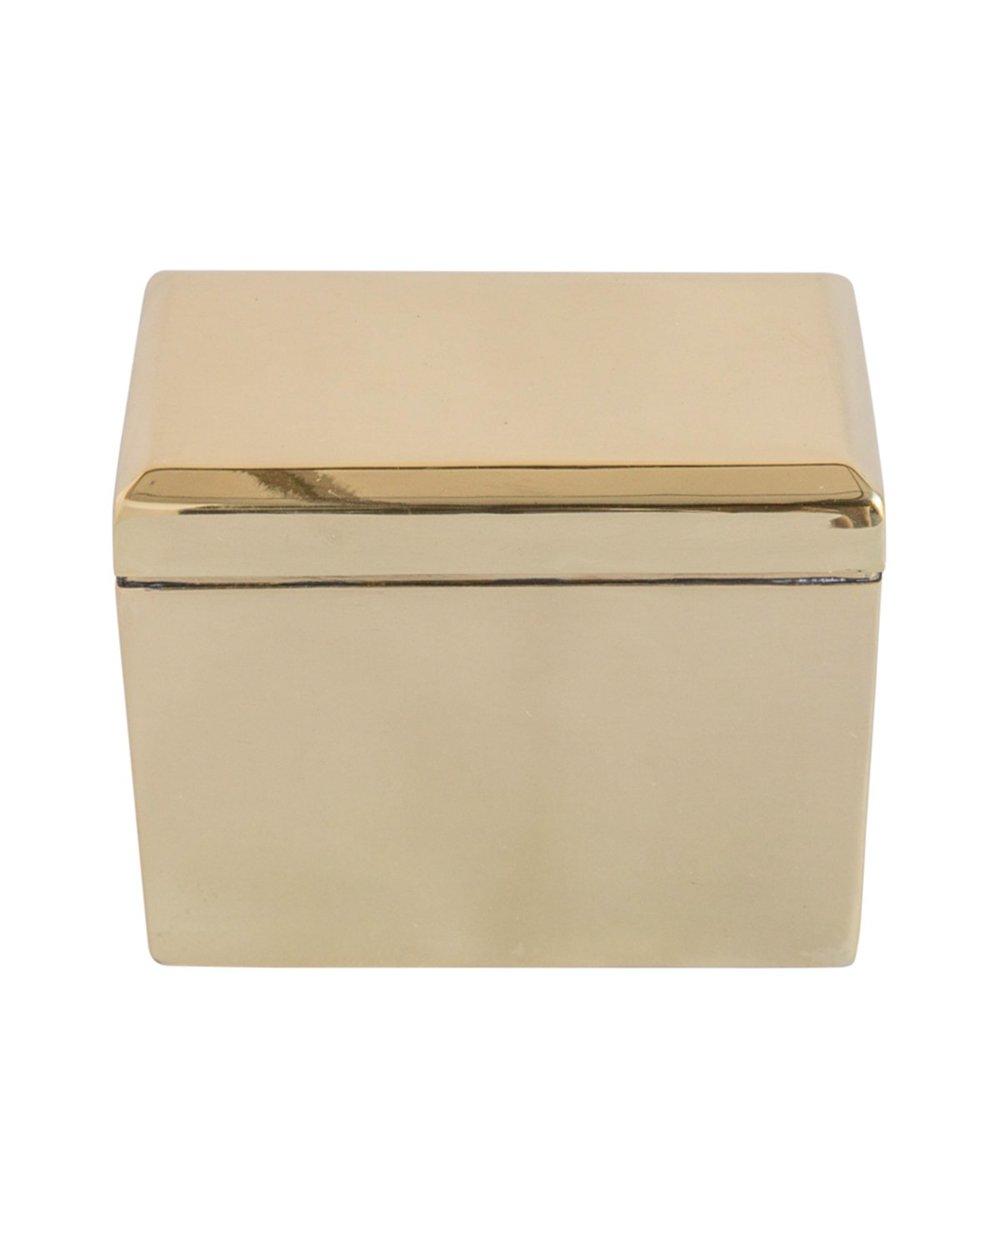 Keepsake_Box_in_Gold_1_e3fdf1d2-542b-45aa-9e12-93a0a92b8b9f.jpg